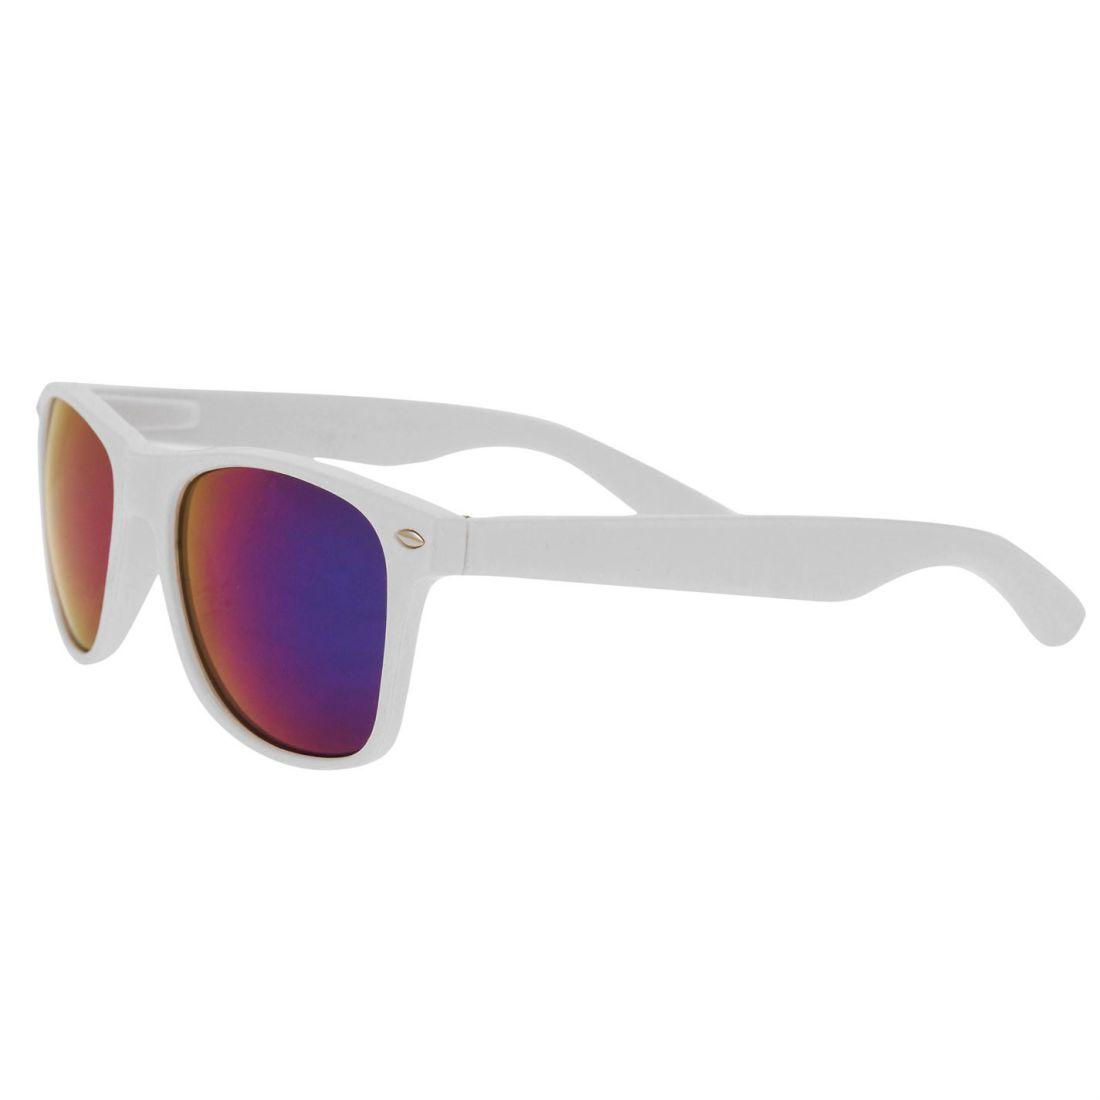 d10cfb12ff2 Pulp Iridescent Sunglasses Mens Gents Summer Plastic Frame Tinted ...